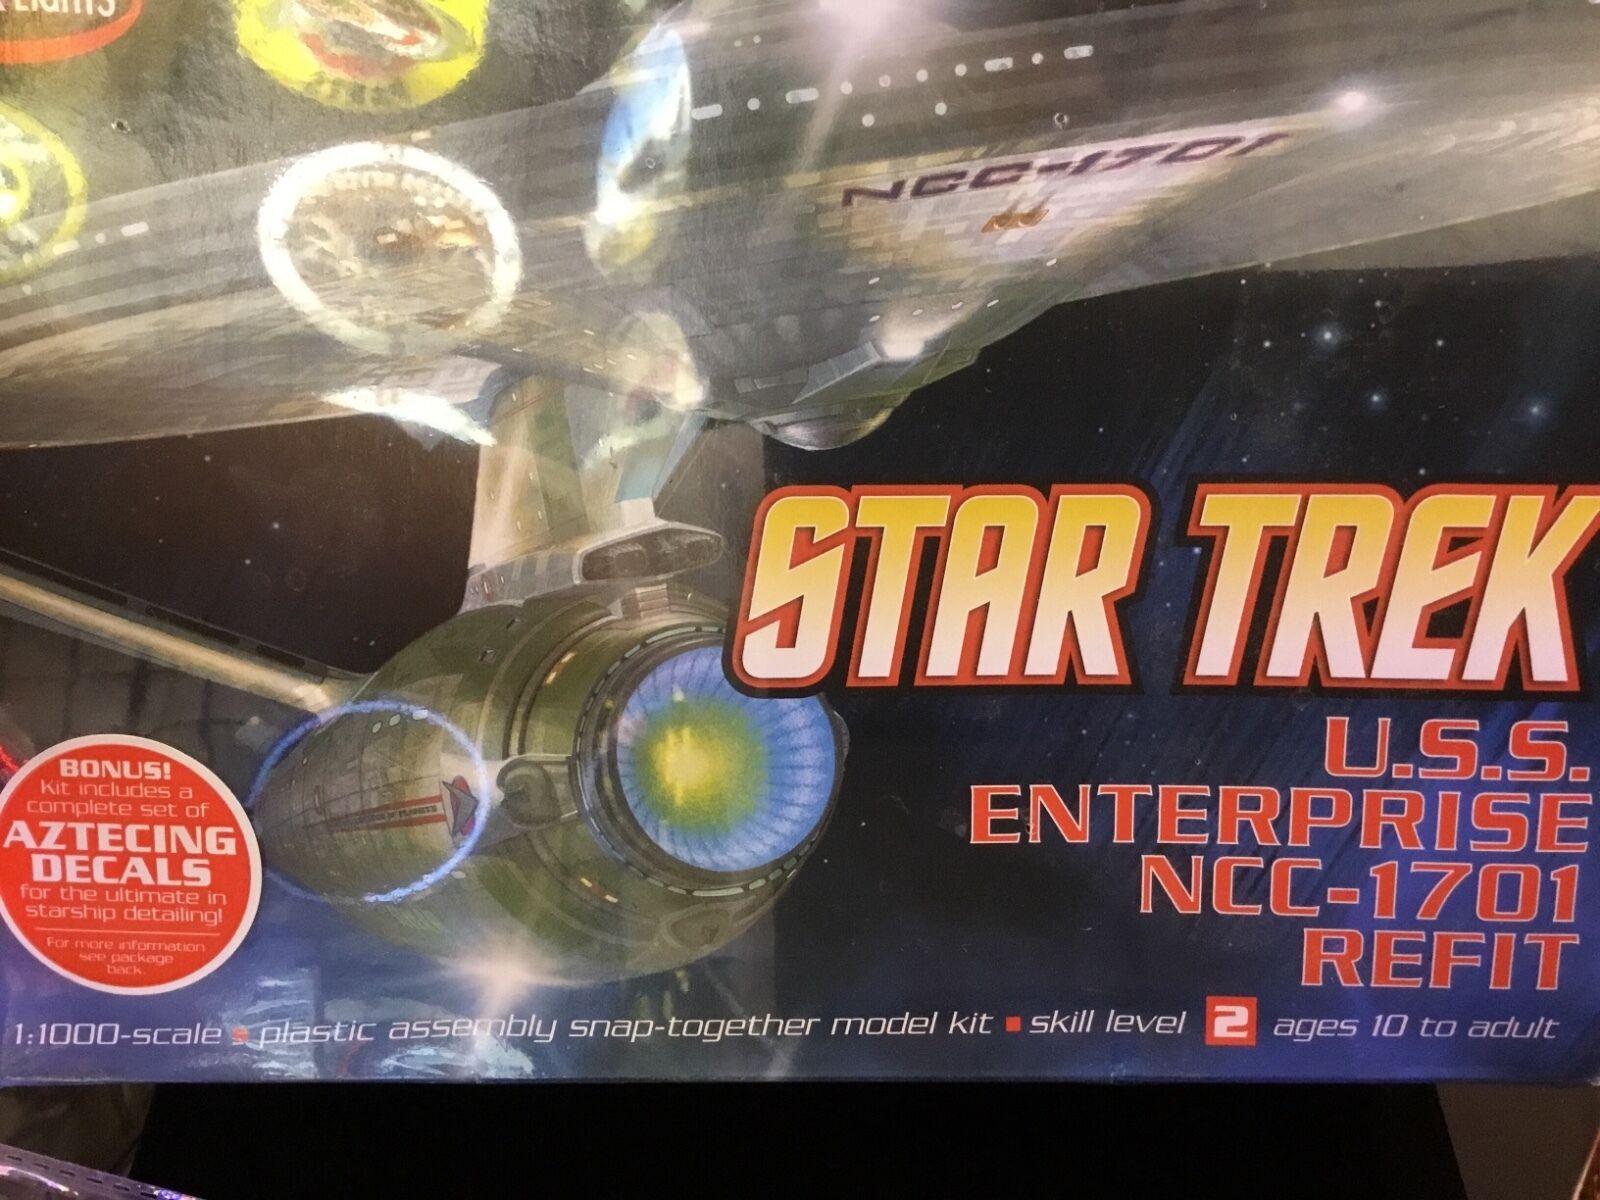 Star trek uss enterprise ncc refit 1 scale model - 1 1000 Uss Enterprise Ncc 1701a Star Trek